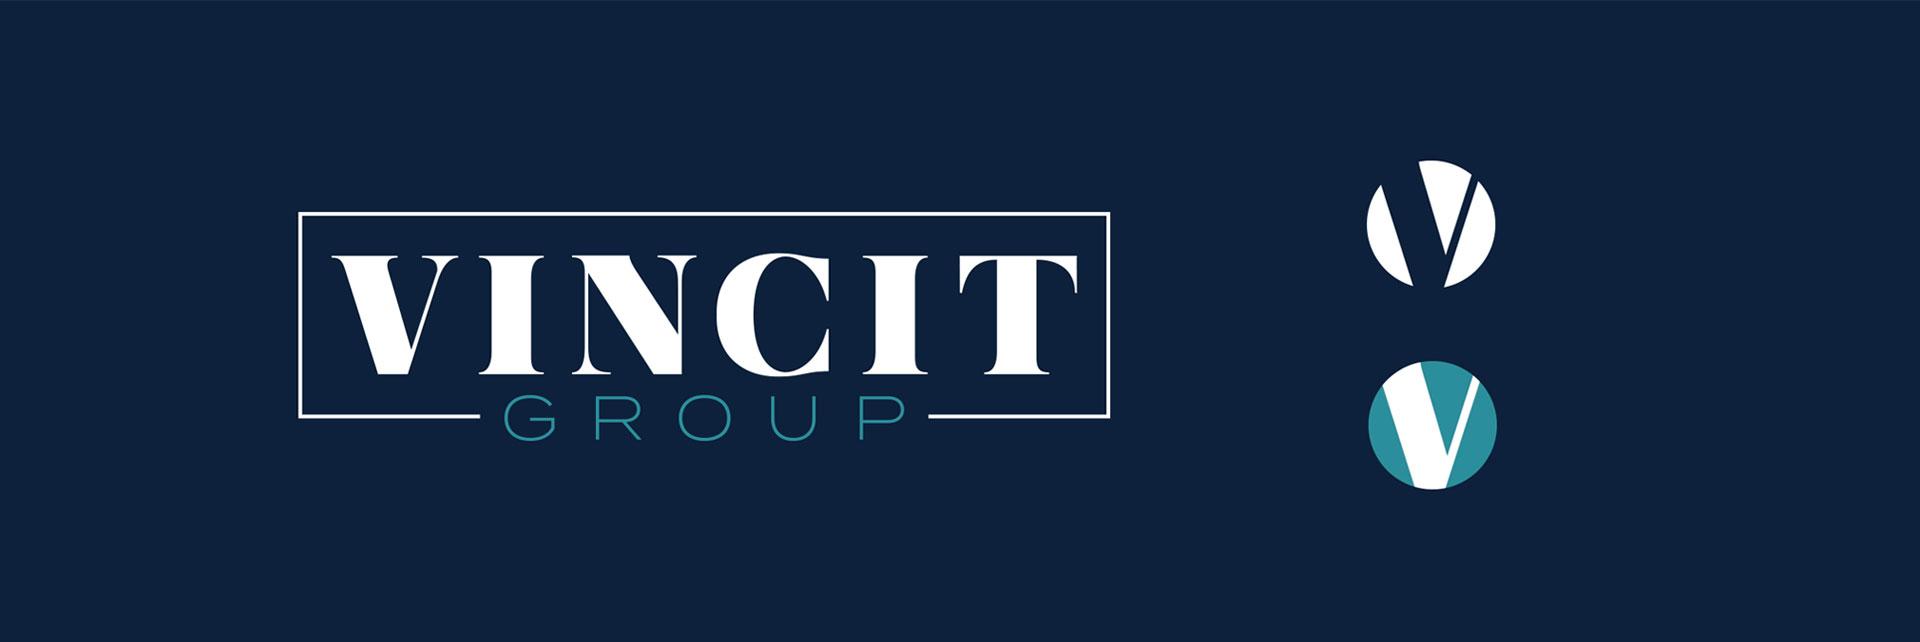 Tiny Giant - The Vincit Group - Brand Identity / Logos